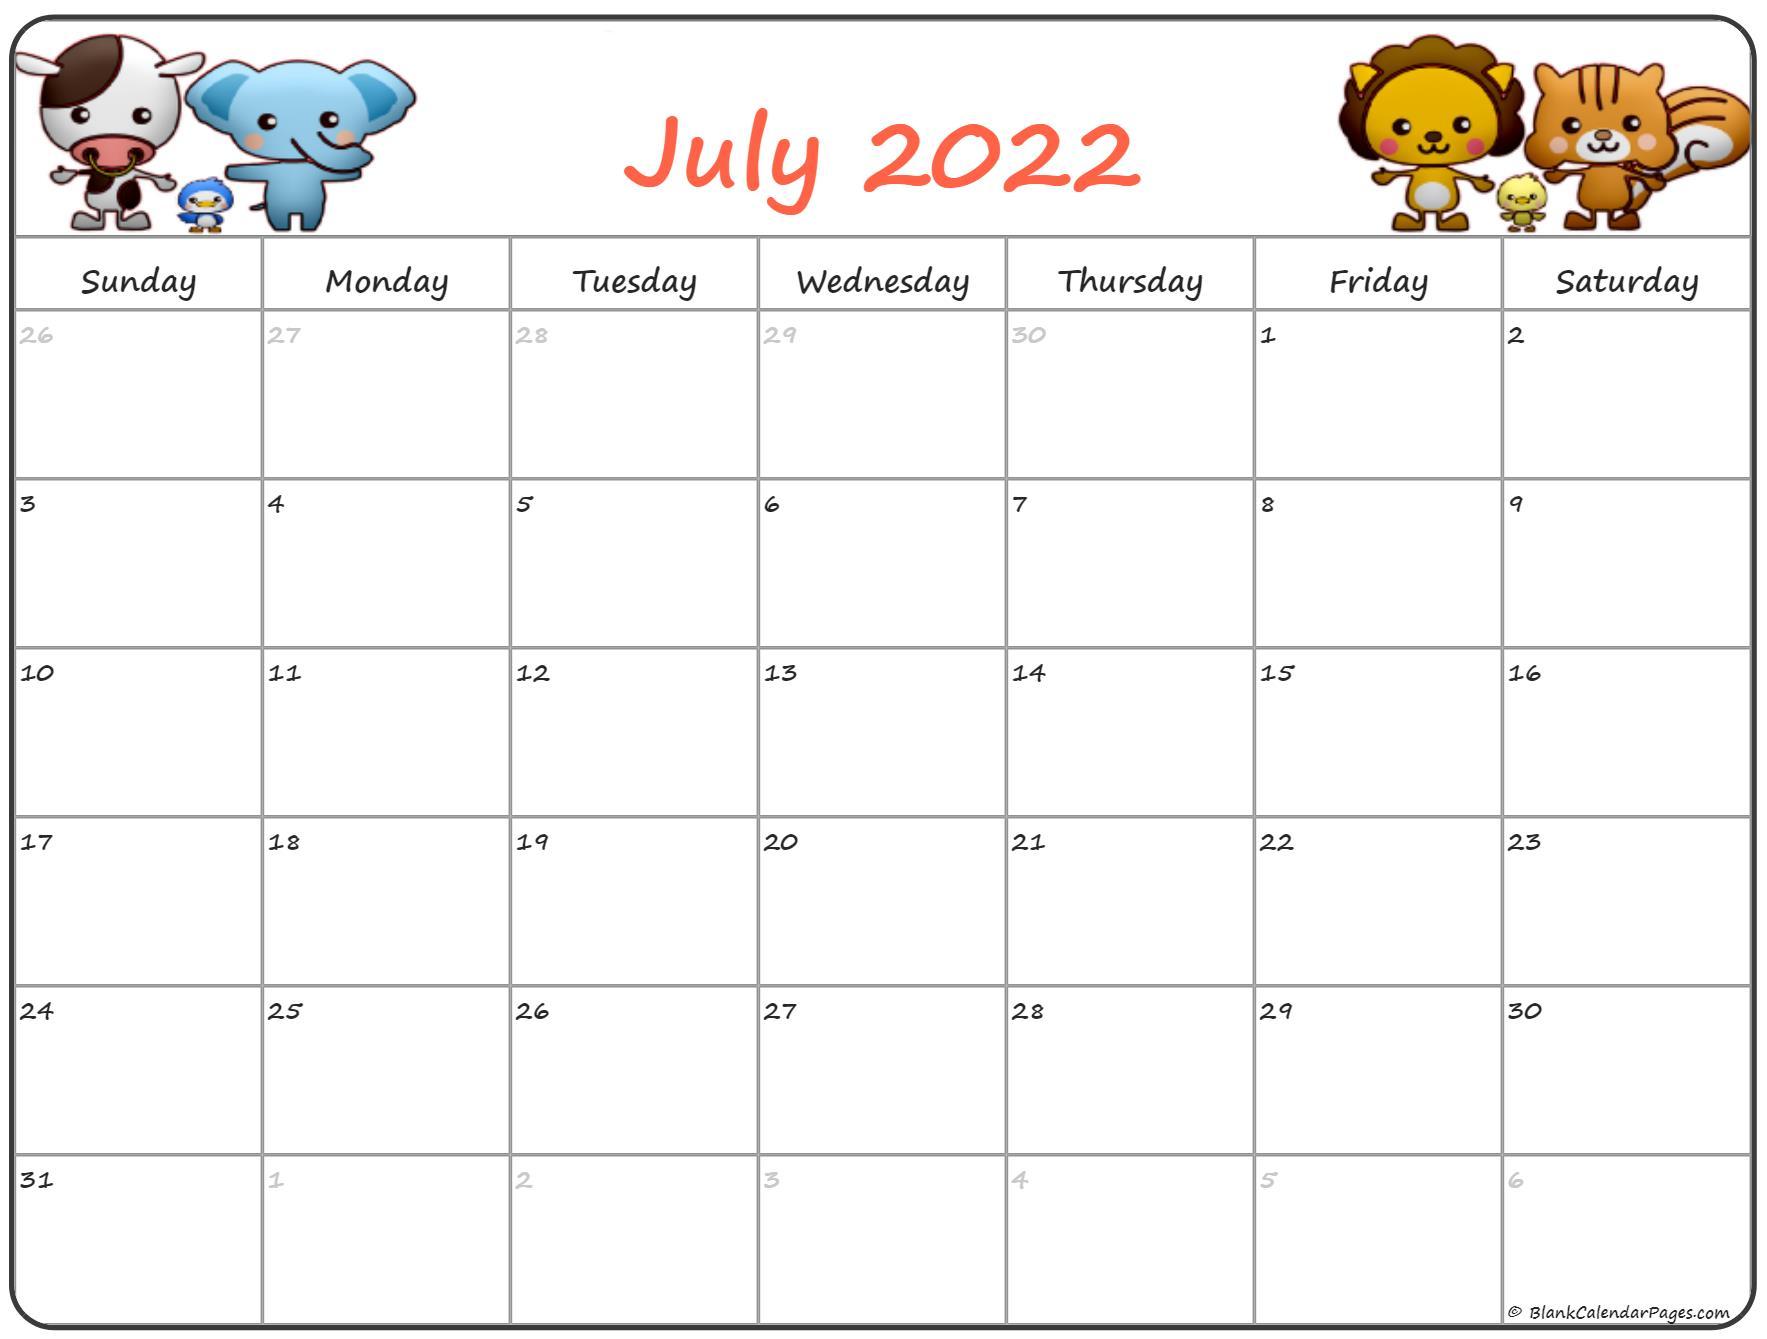 July 2022 Pregnancy Calendar | Fertility Calendar With Regard To January 2022 Printable Calendar Cute